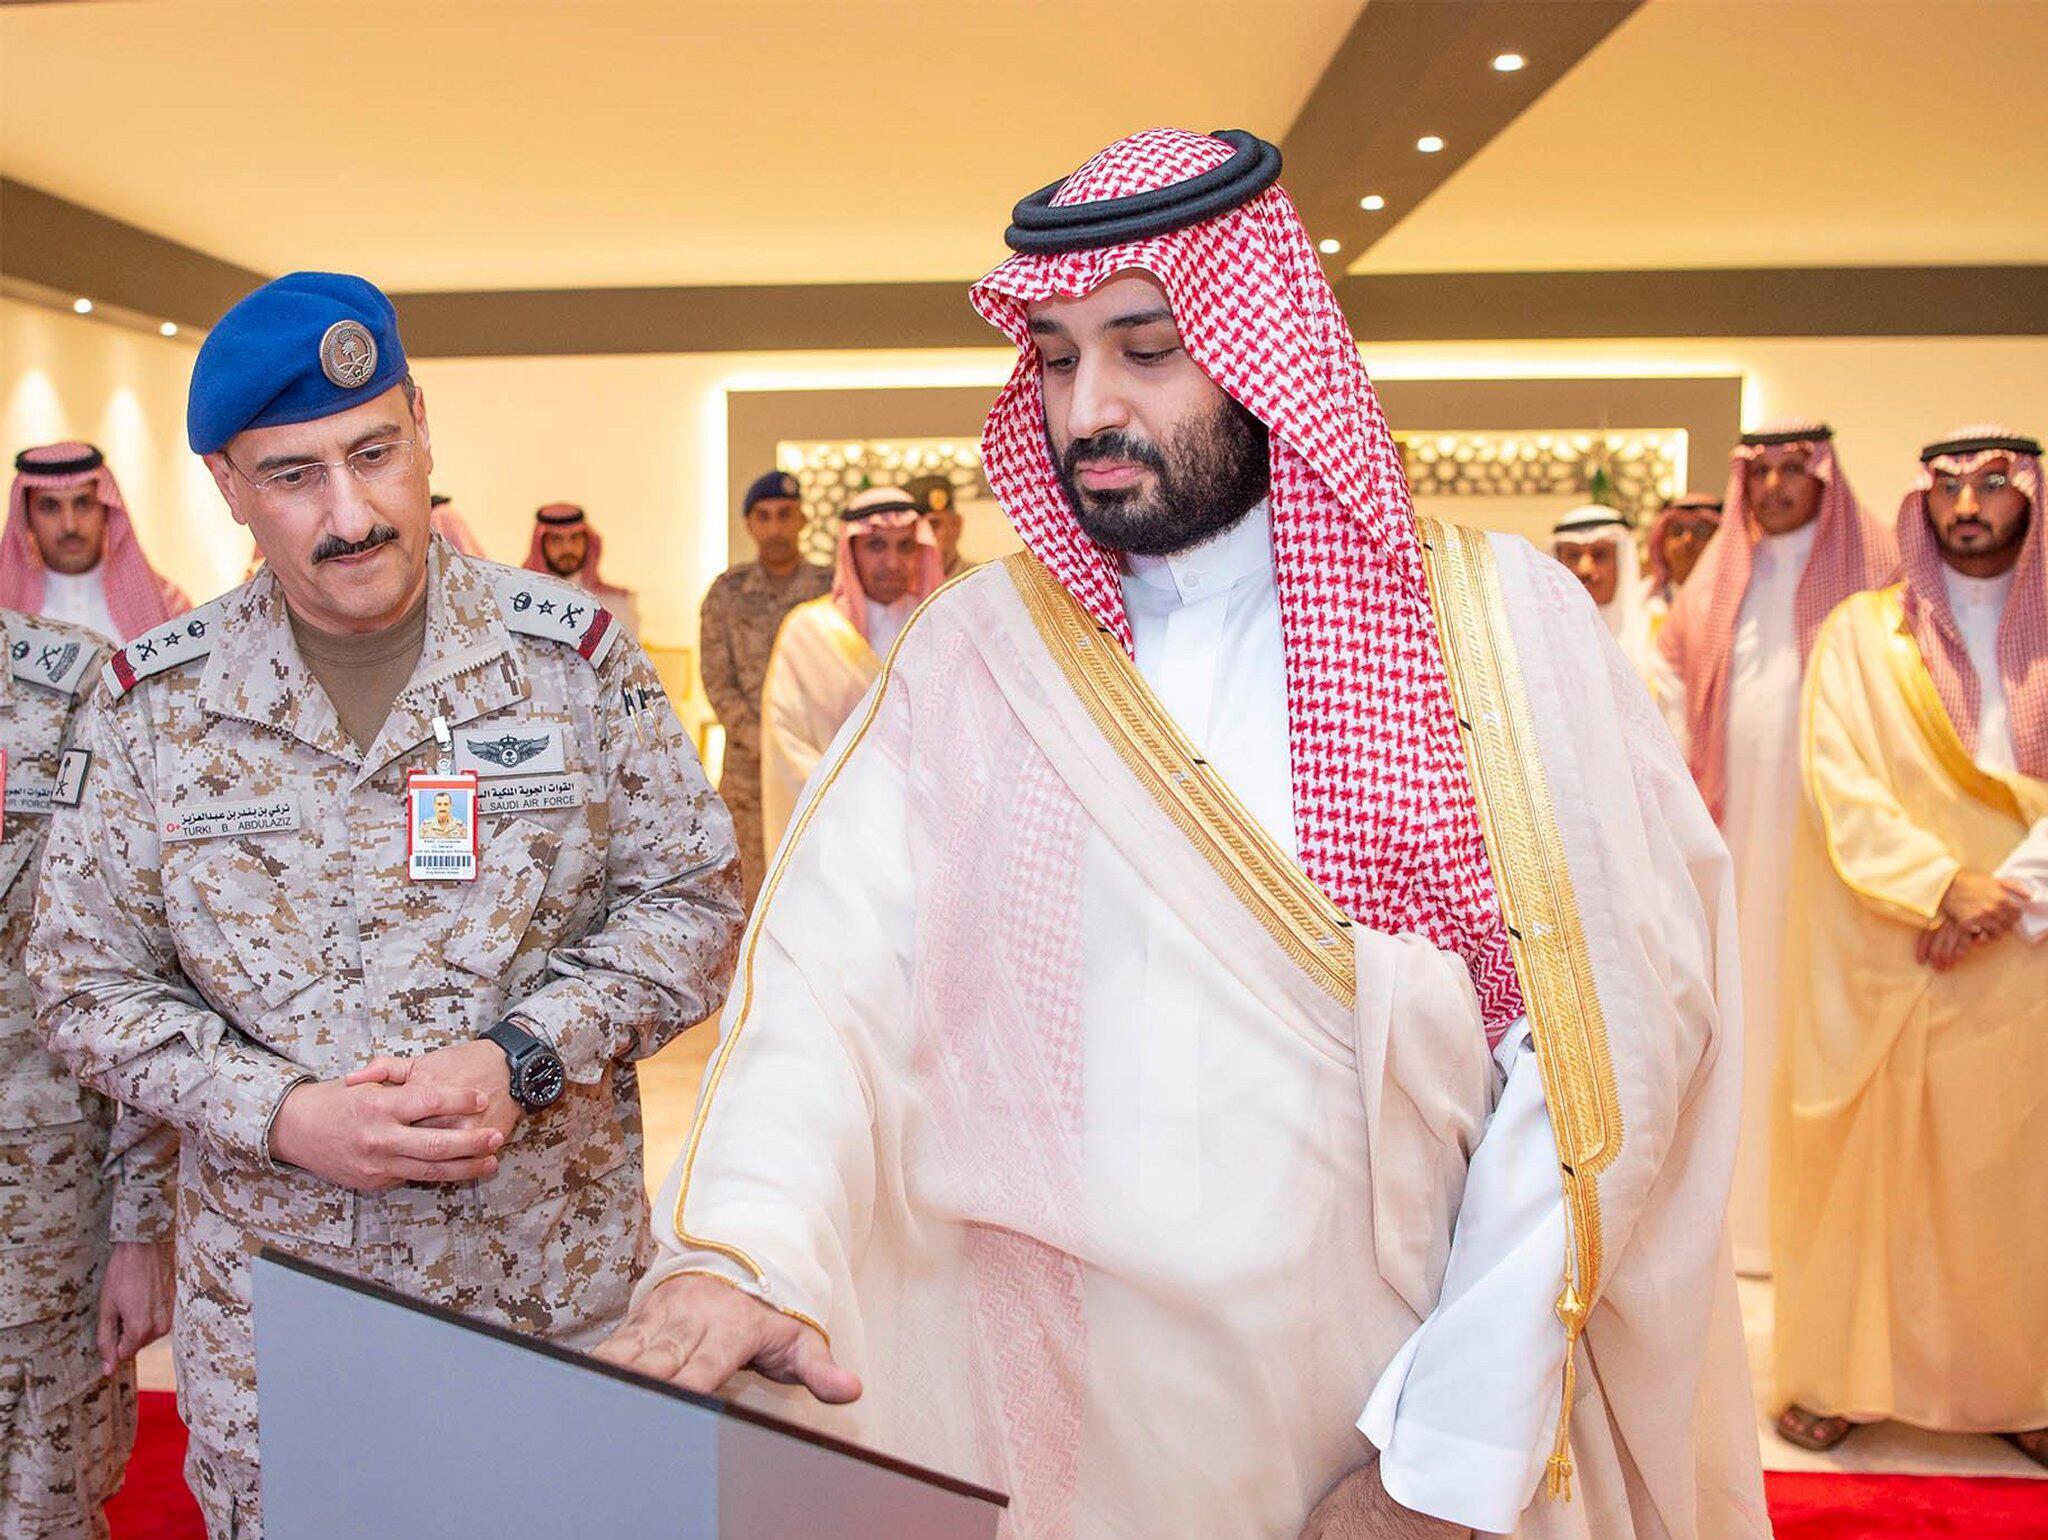 Bild zu Mohammed bin Salman